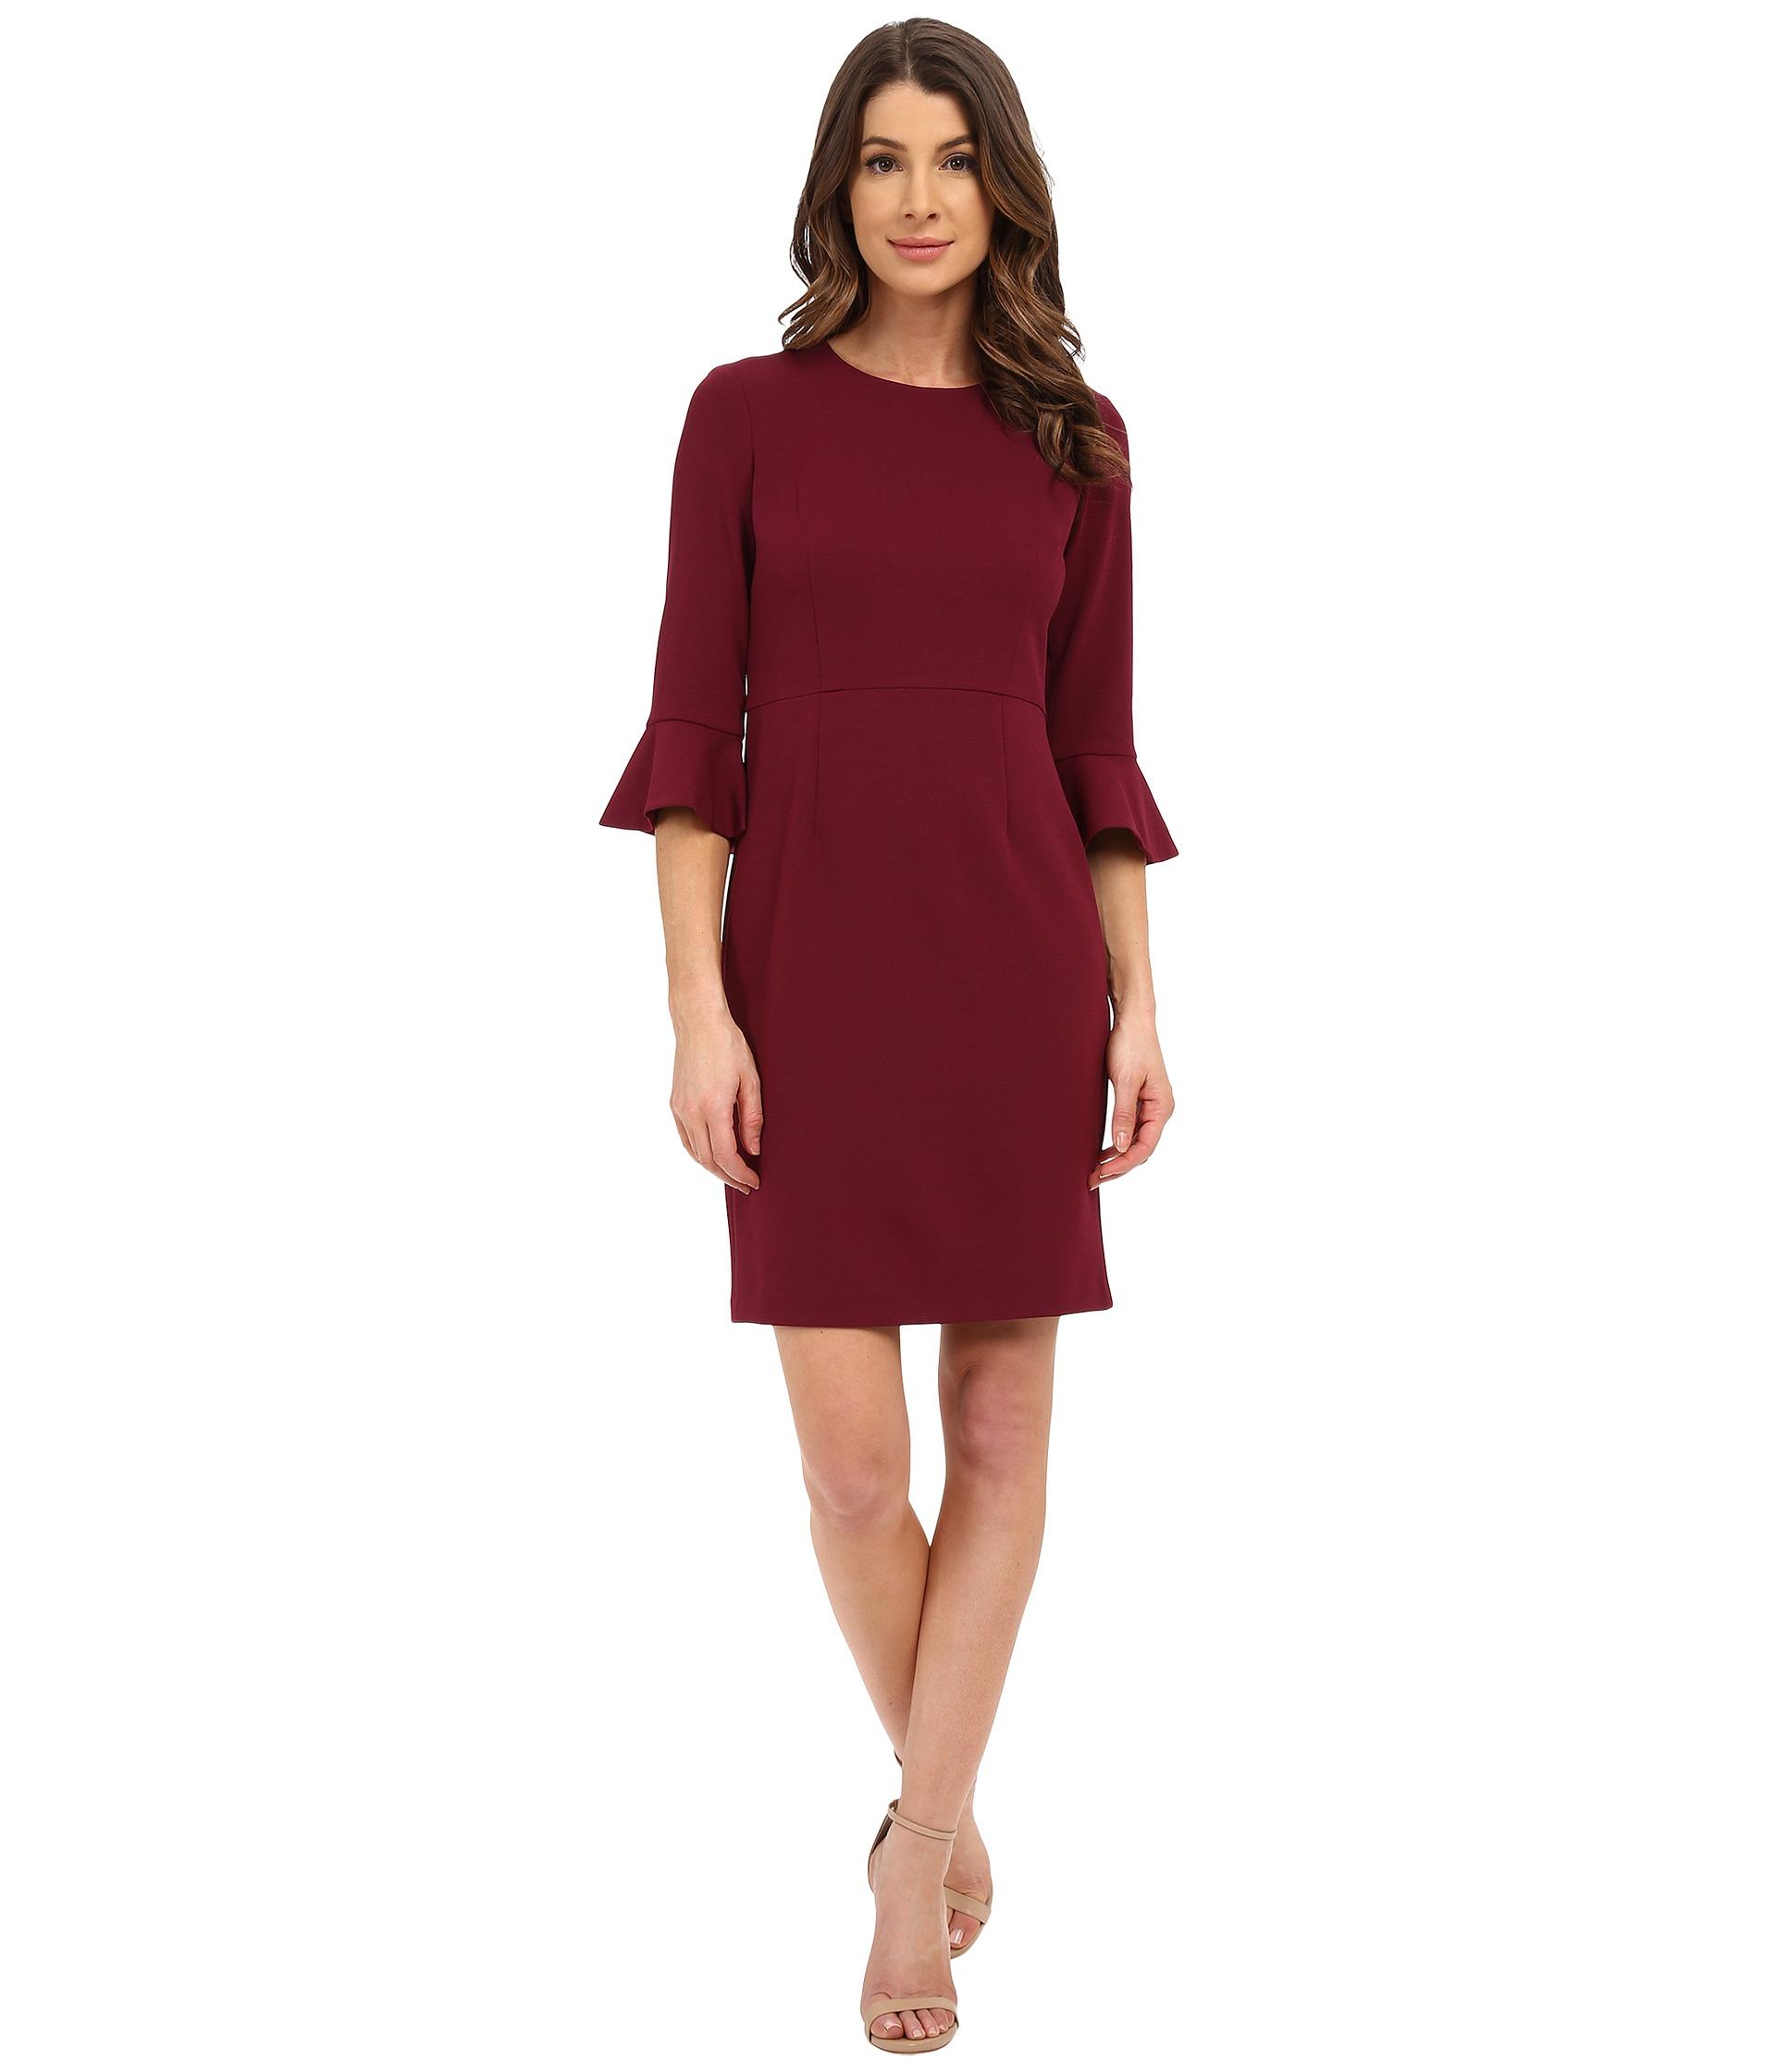 Morgan red dress